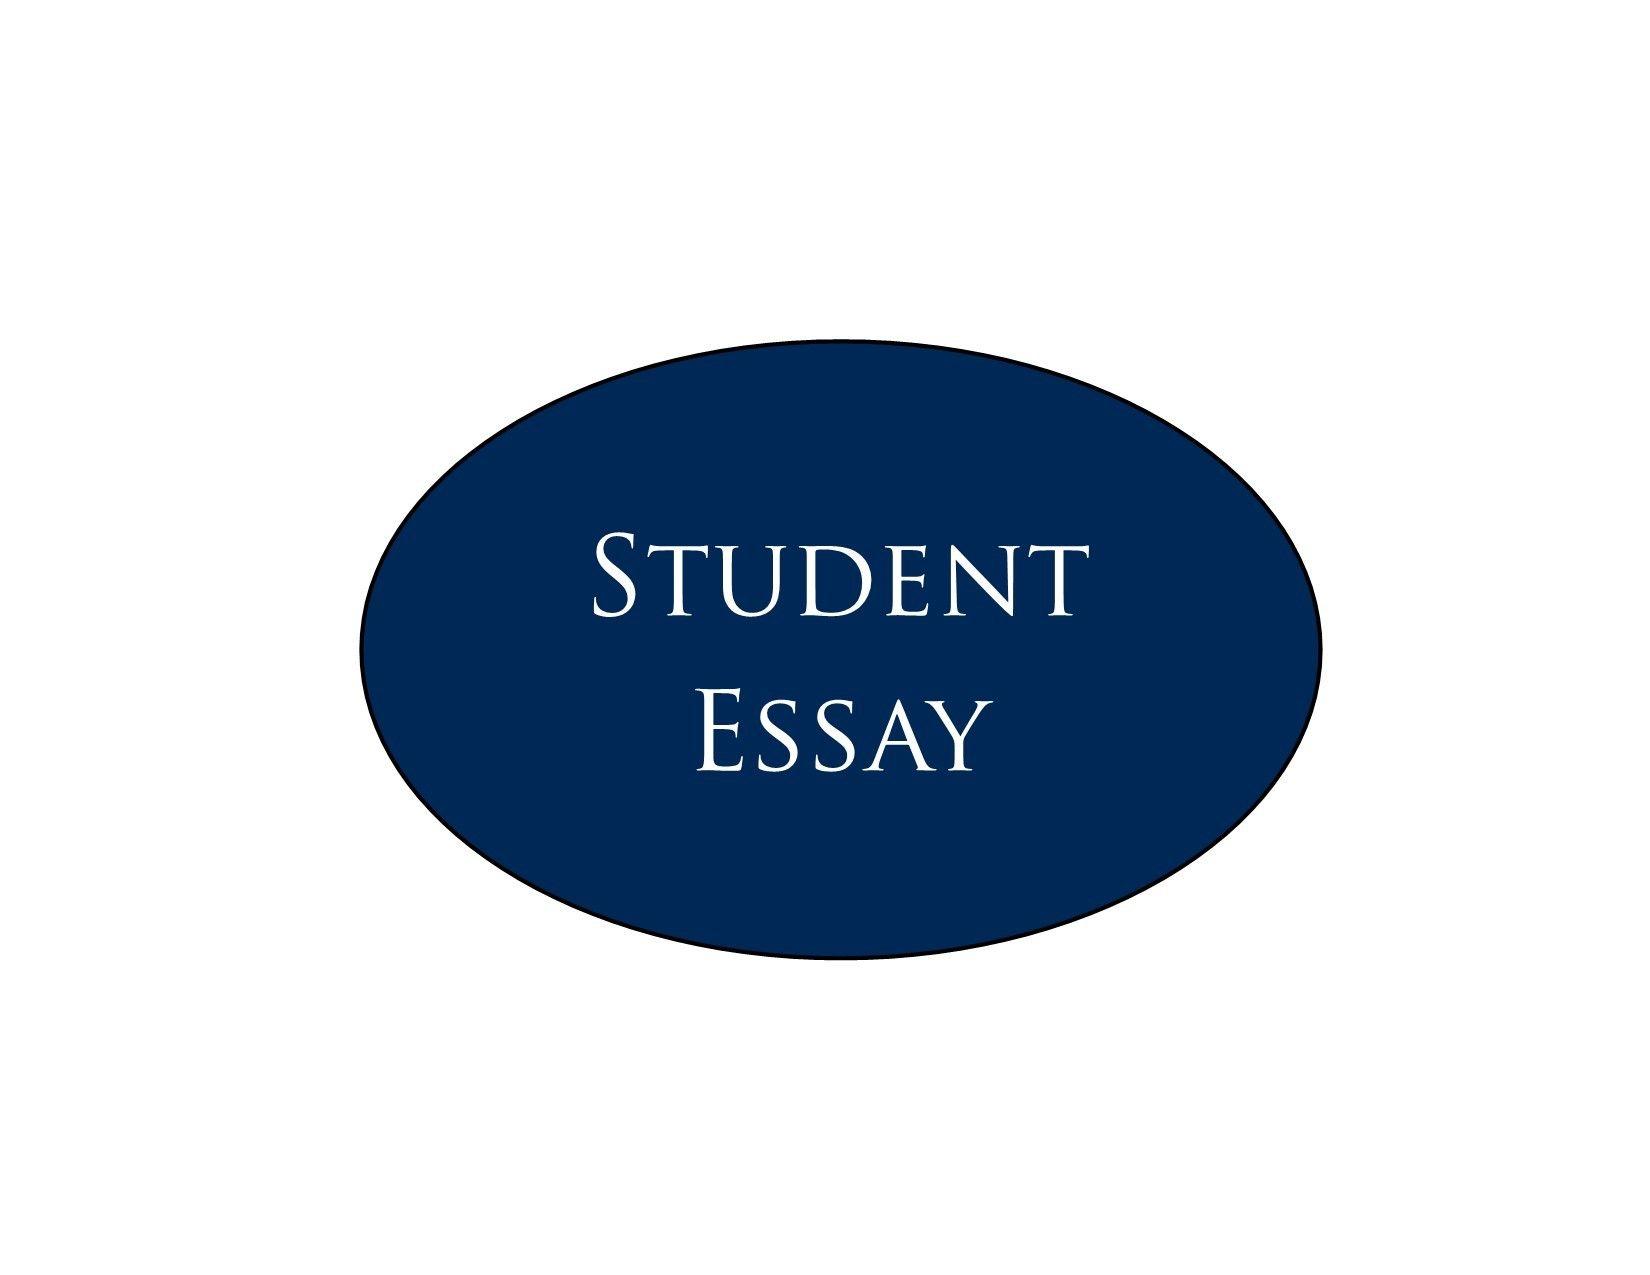 Student Essay